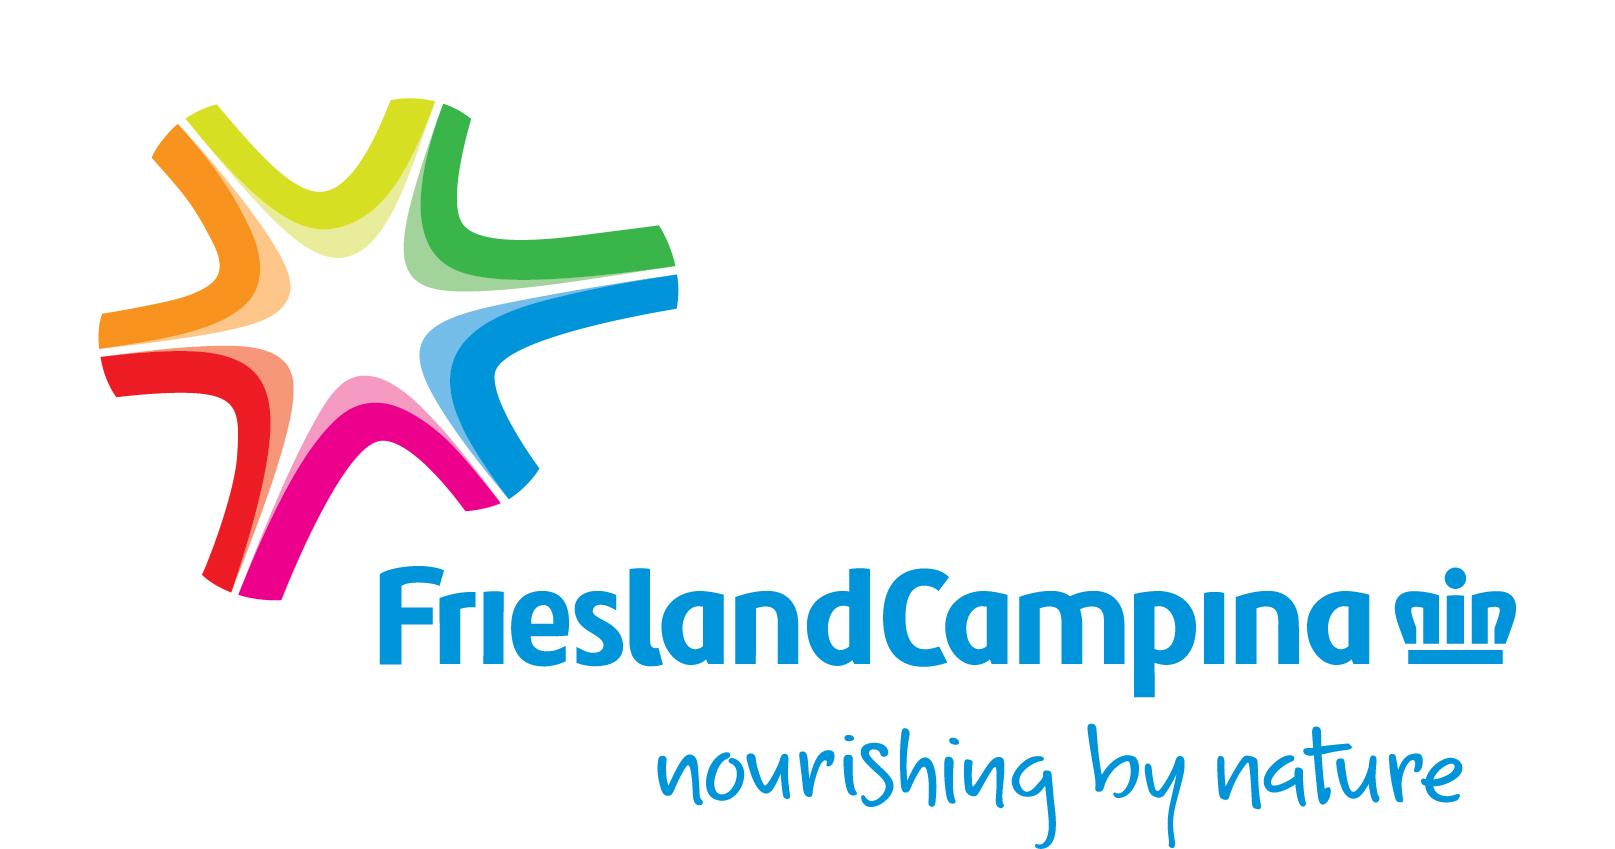 https://europeanplasticspact.org/wp-content/uploads/2021/05/friesland-campina_logo.jpg